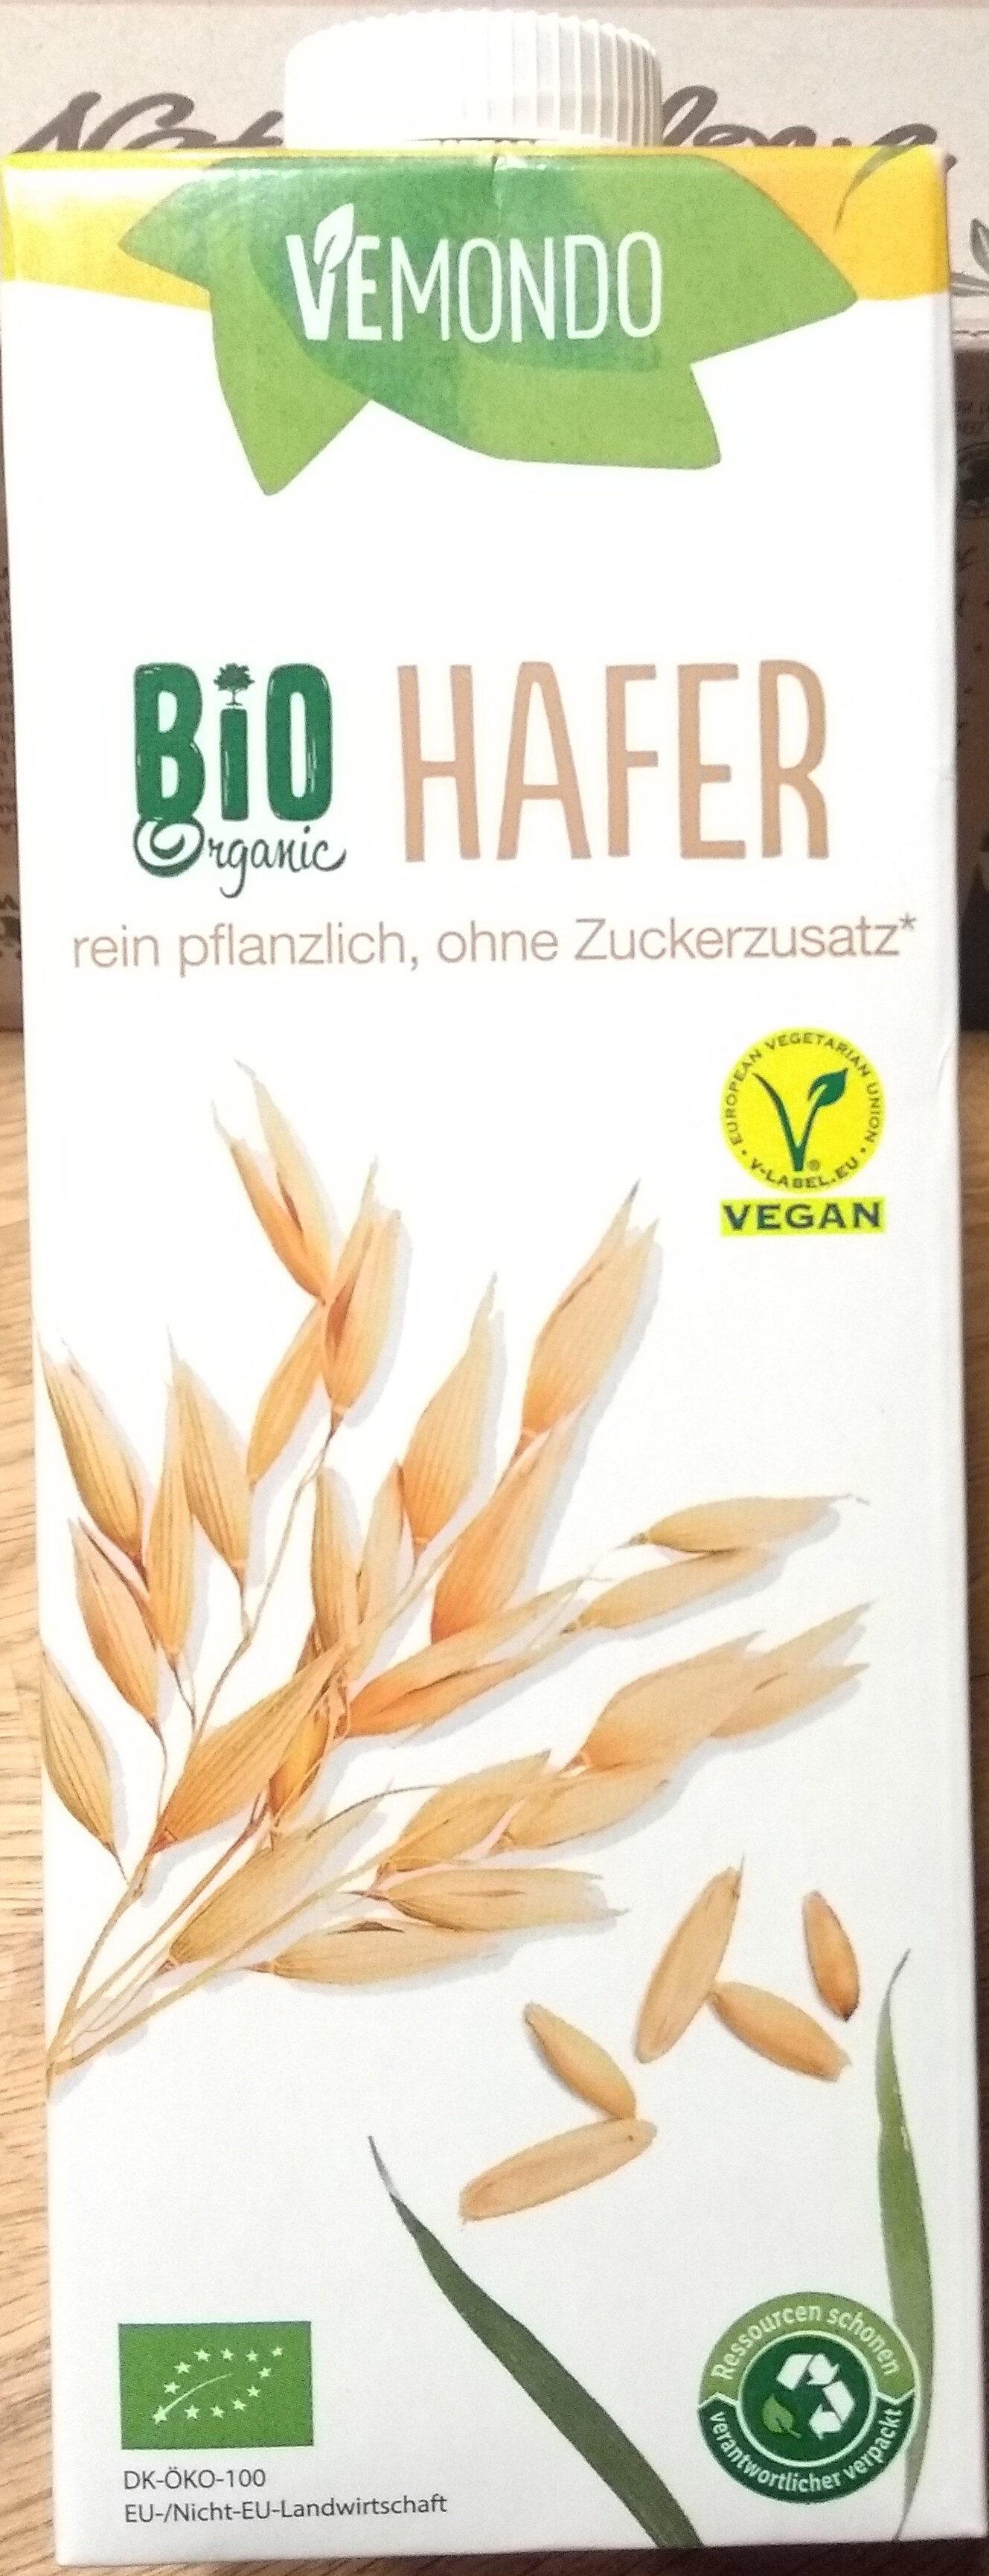 Bio Hafer - Produkt - de